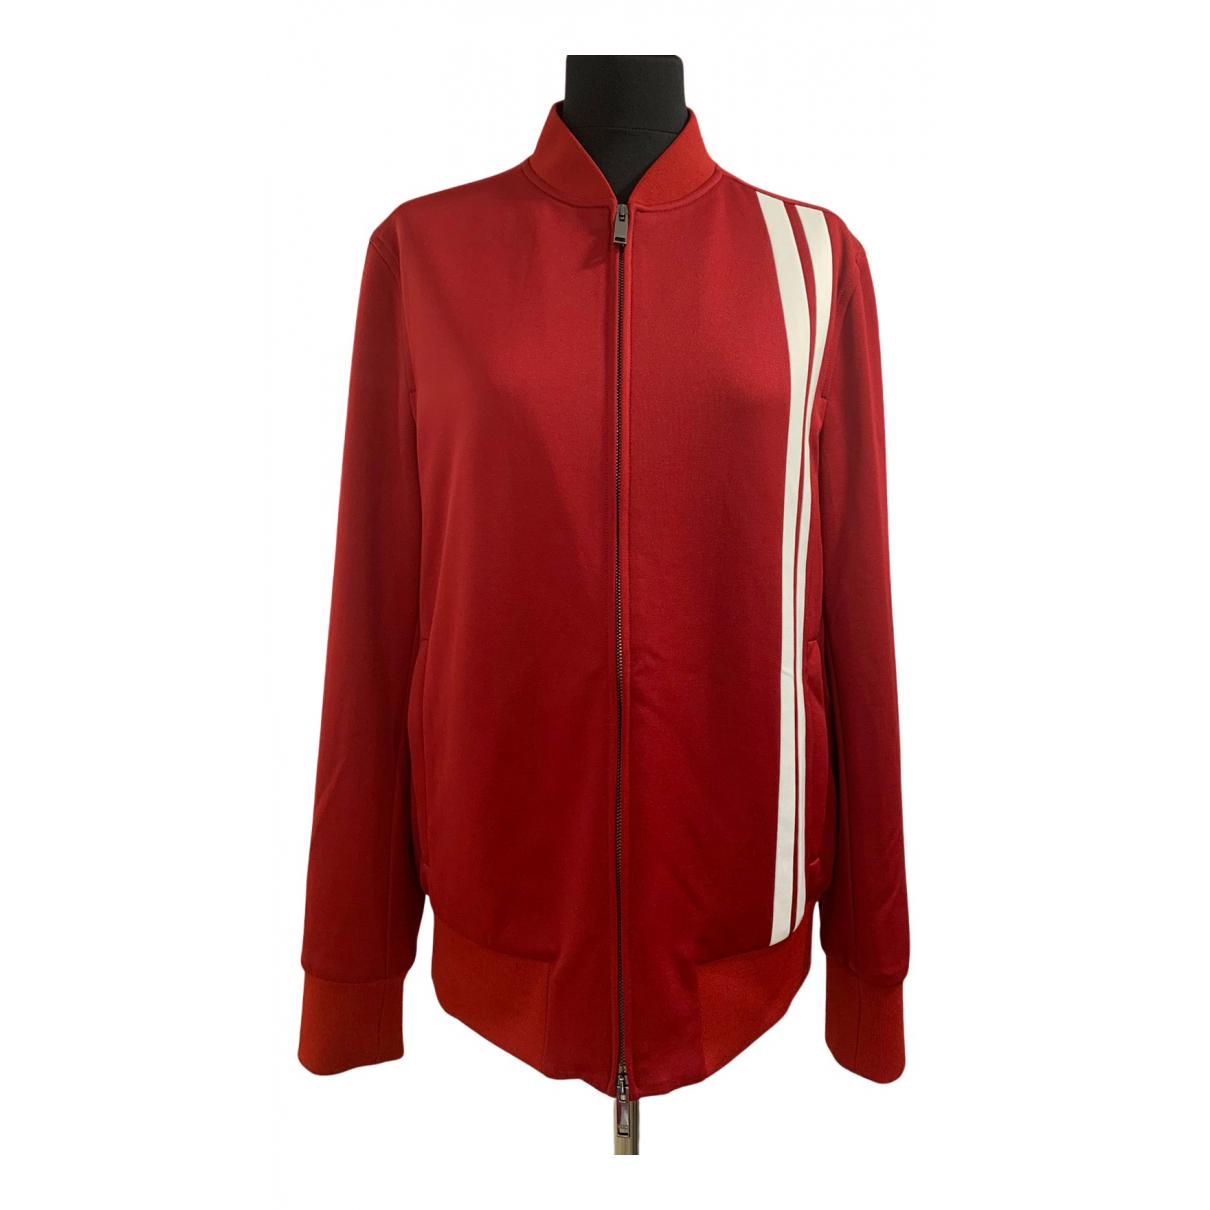 Valentino Garavani N Red Knitwear for Women 48 FR